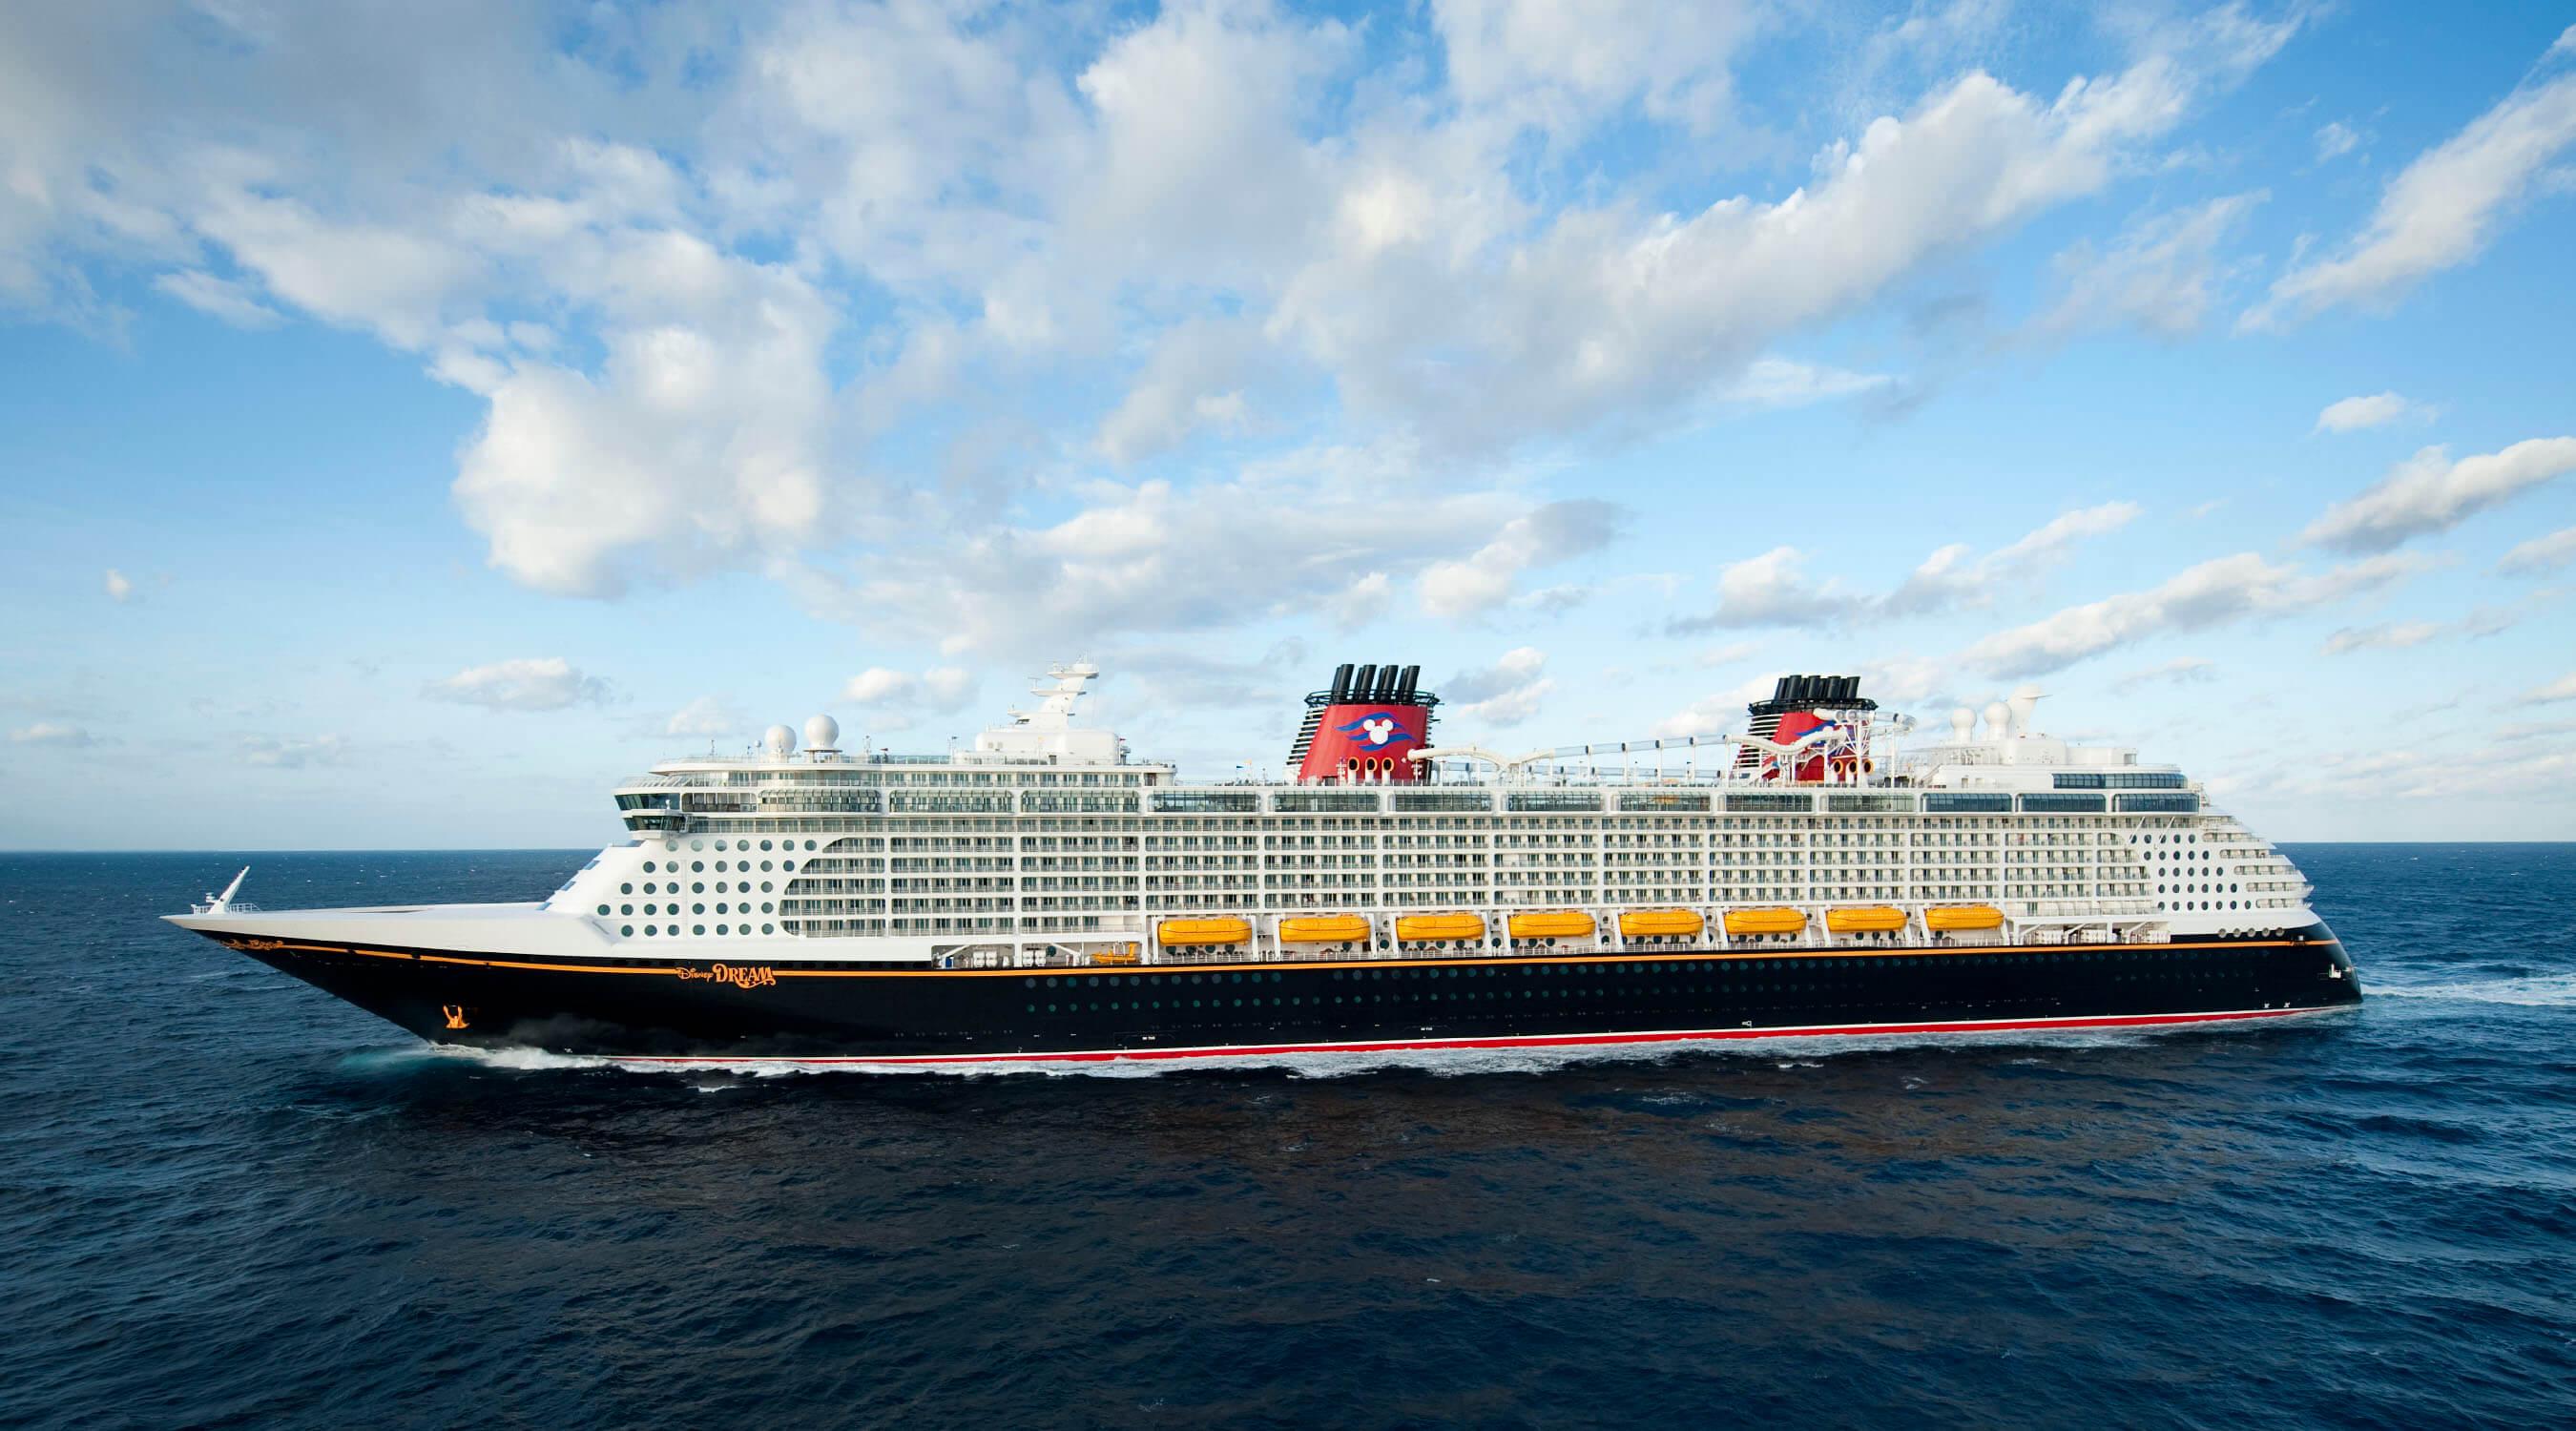 2017 Cruisers Choice Awards Best Cruise Ships Of 2016 Cruise Critic